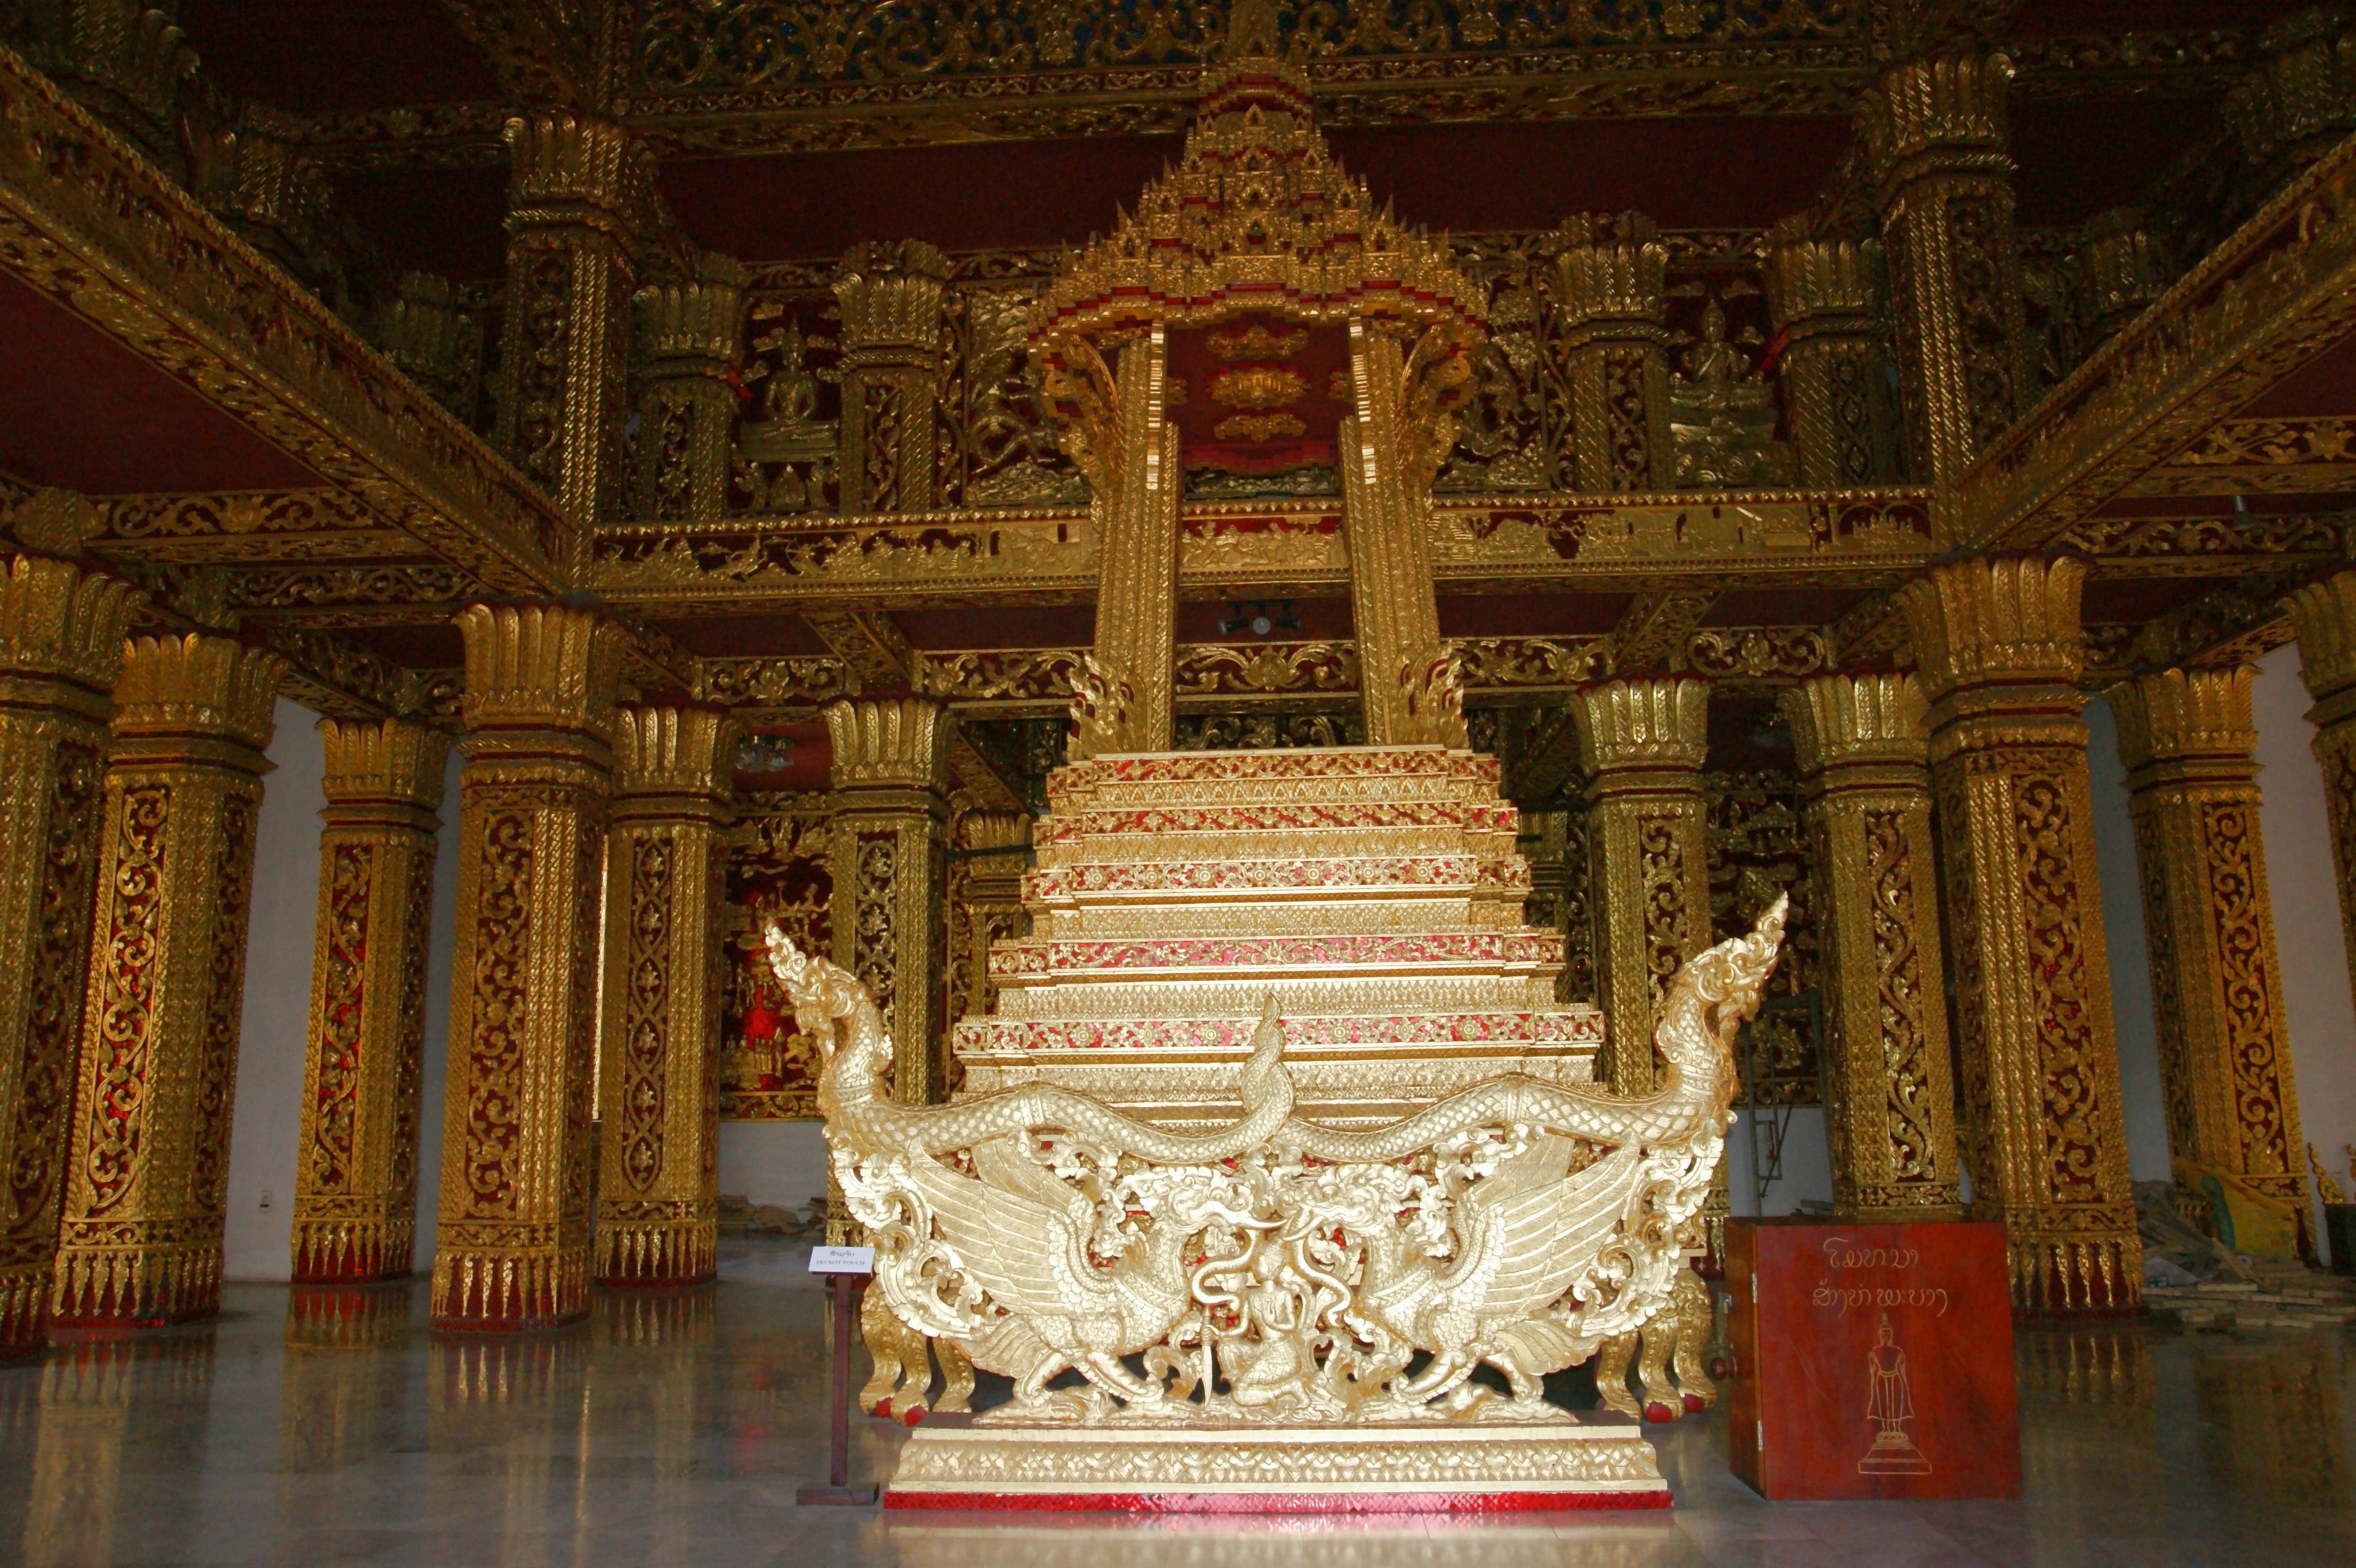 File:Haw Kham palace interior art (2009).jpg - Wikimedia Commons